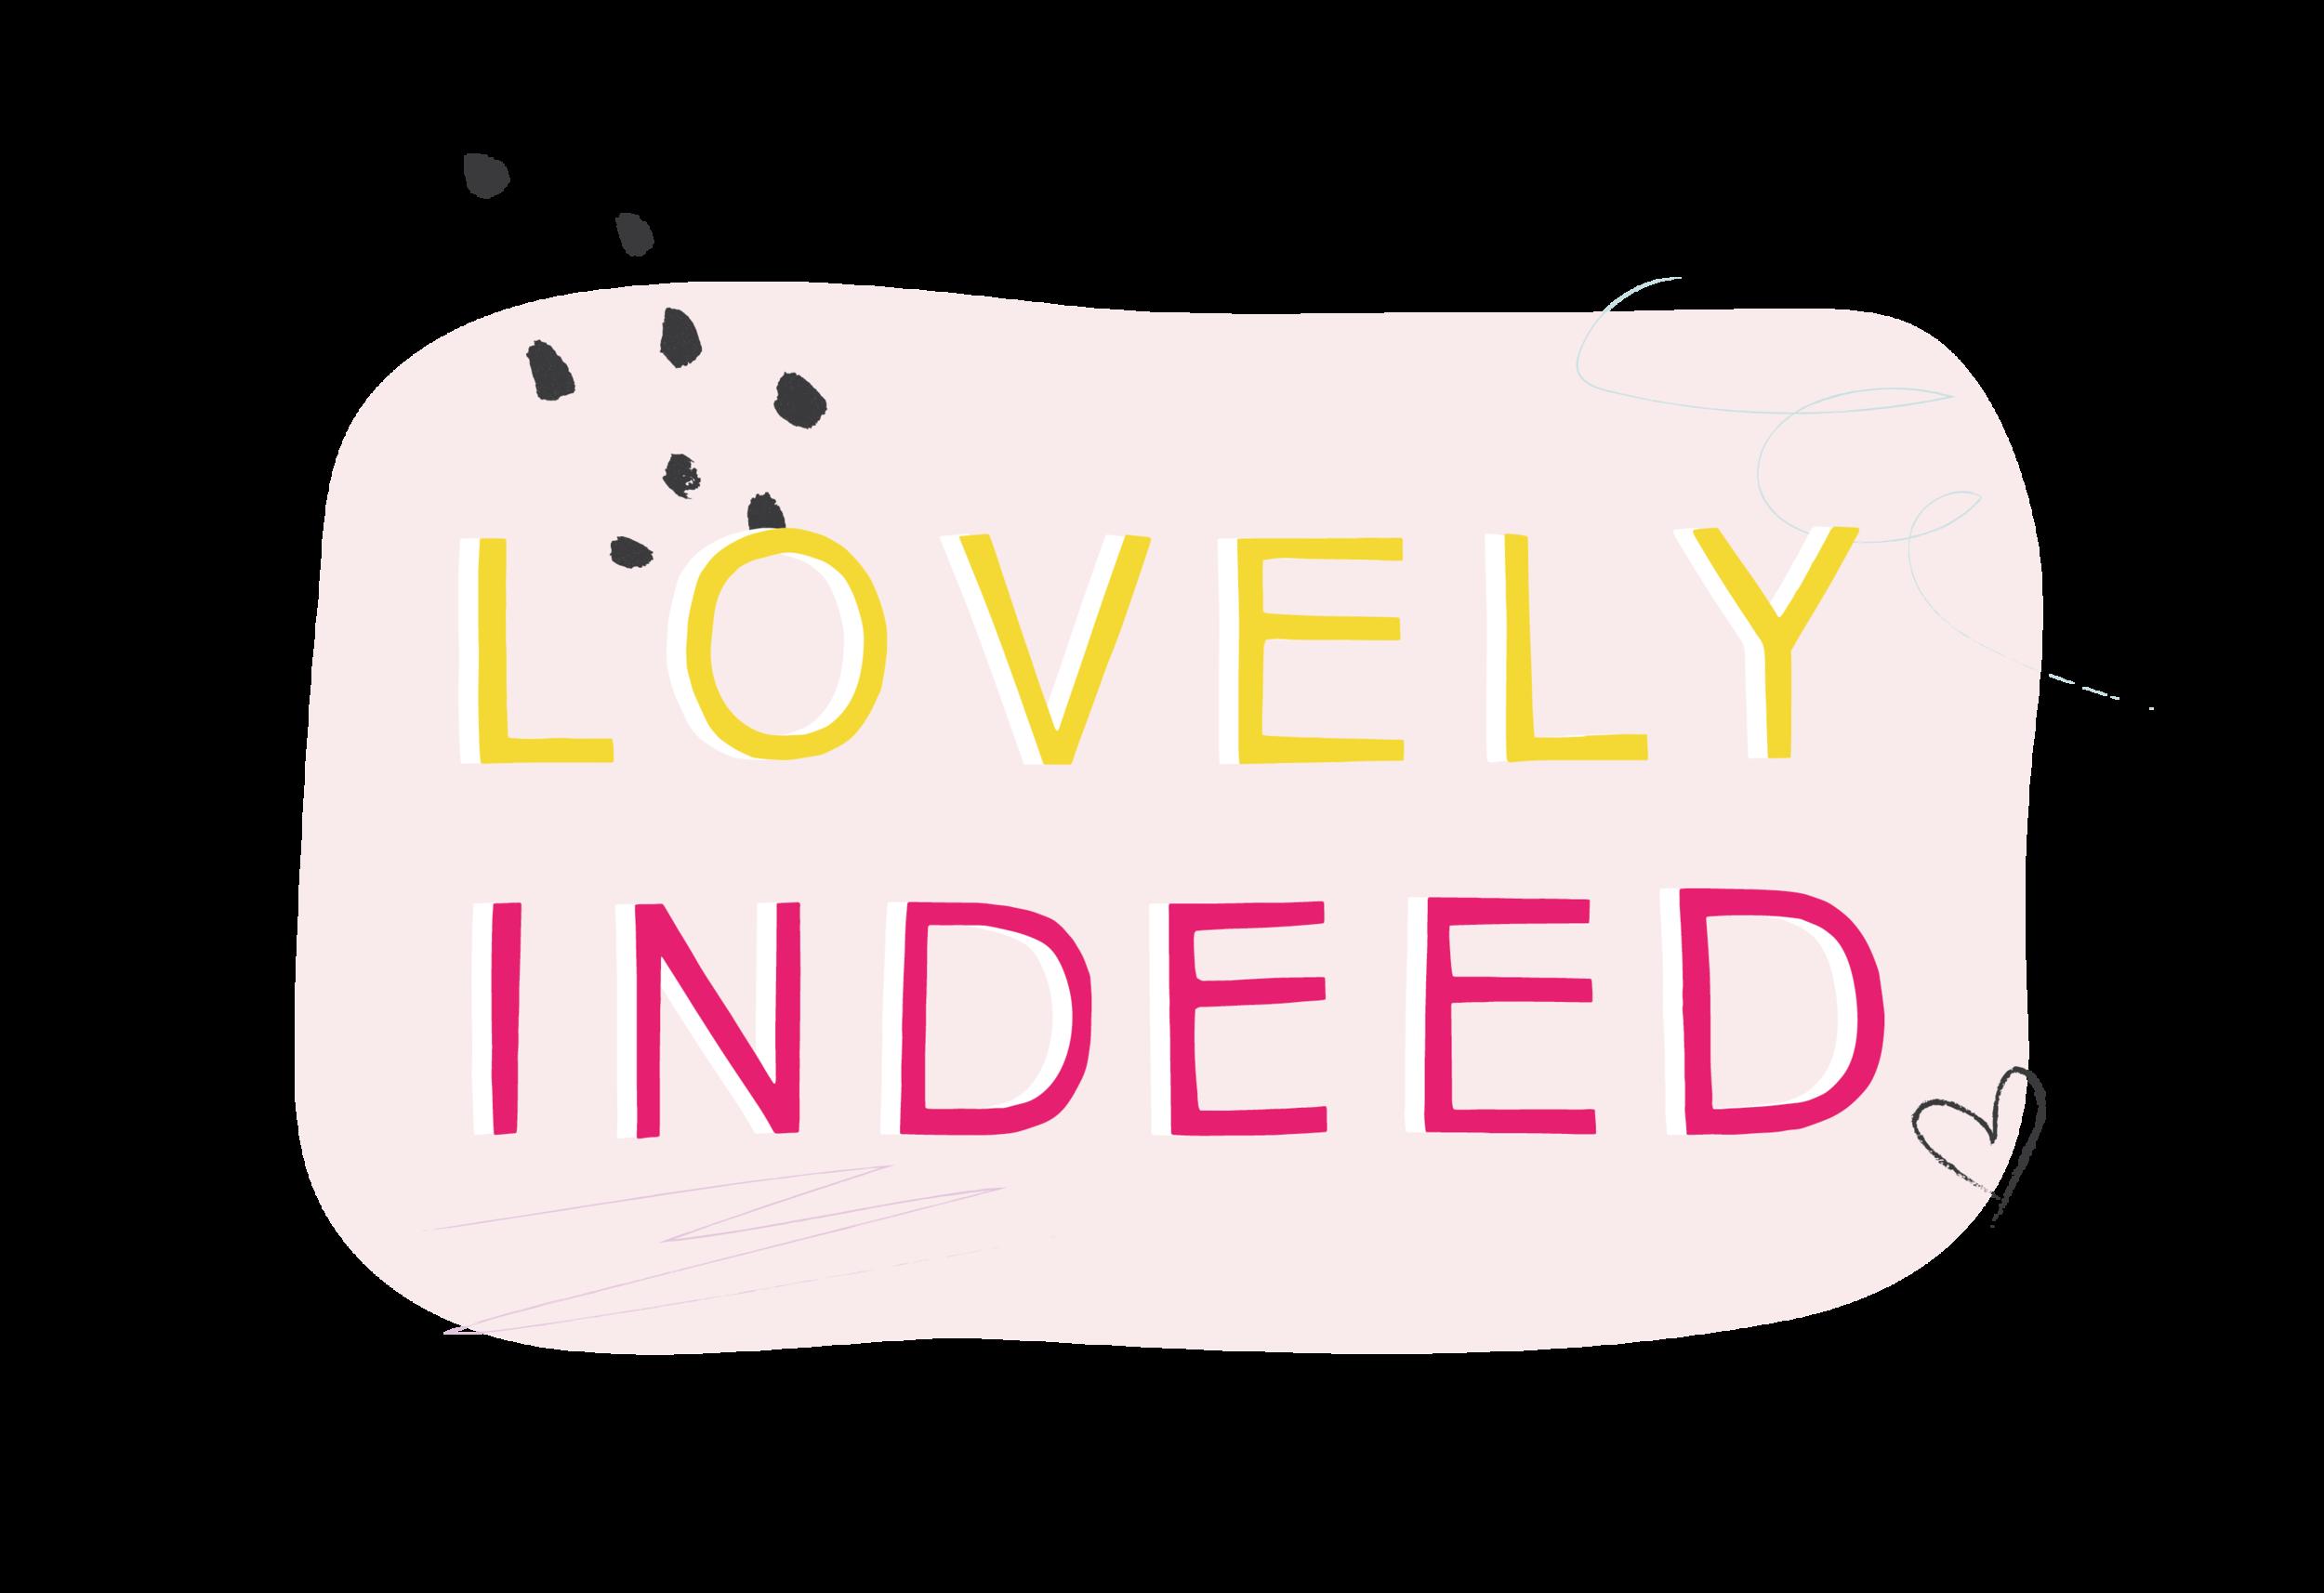 lovelyindeed_logo-01.png